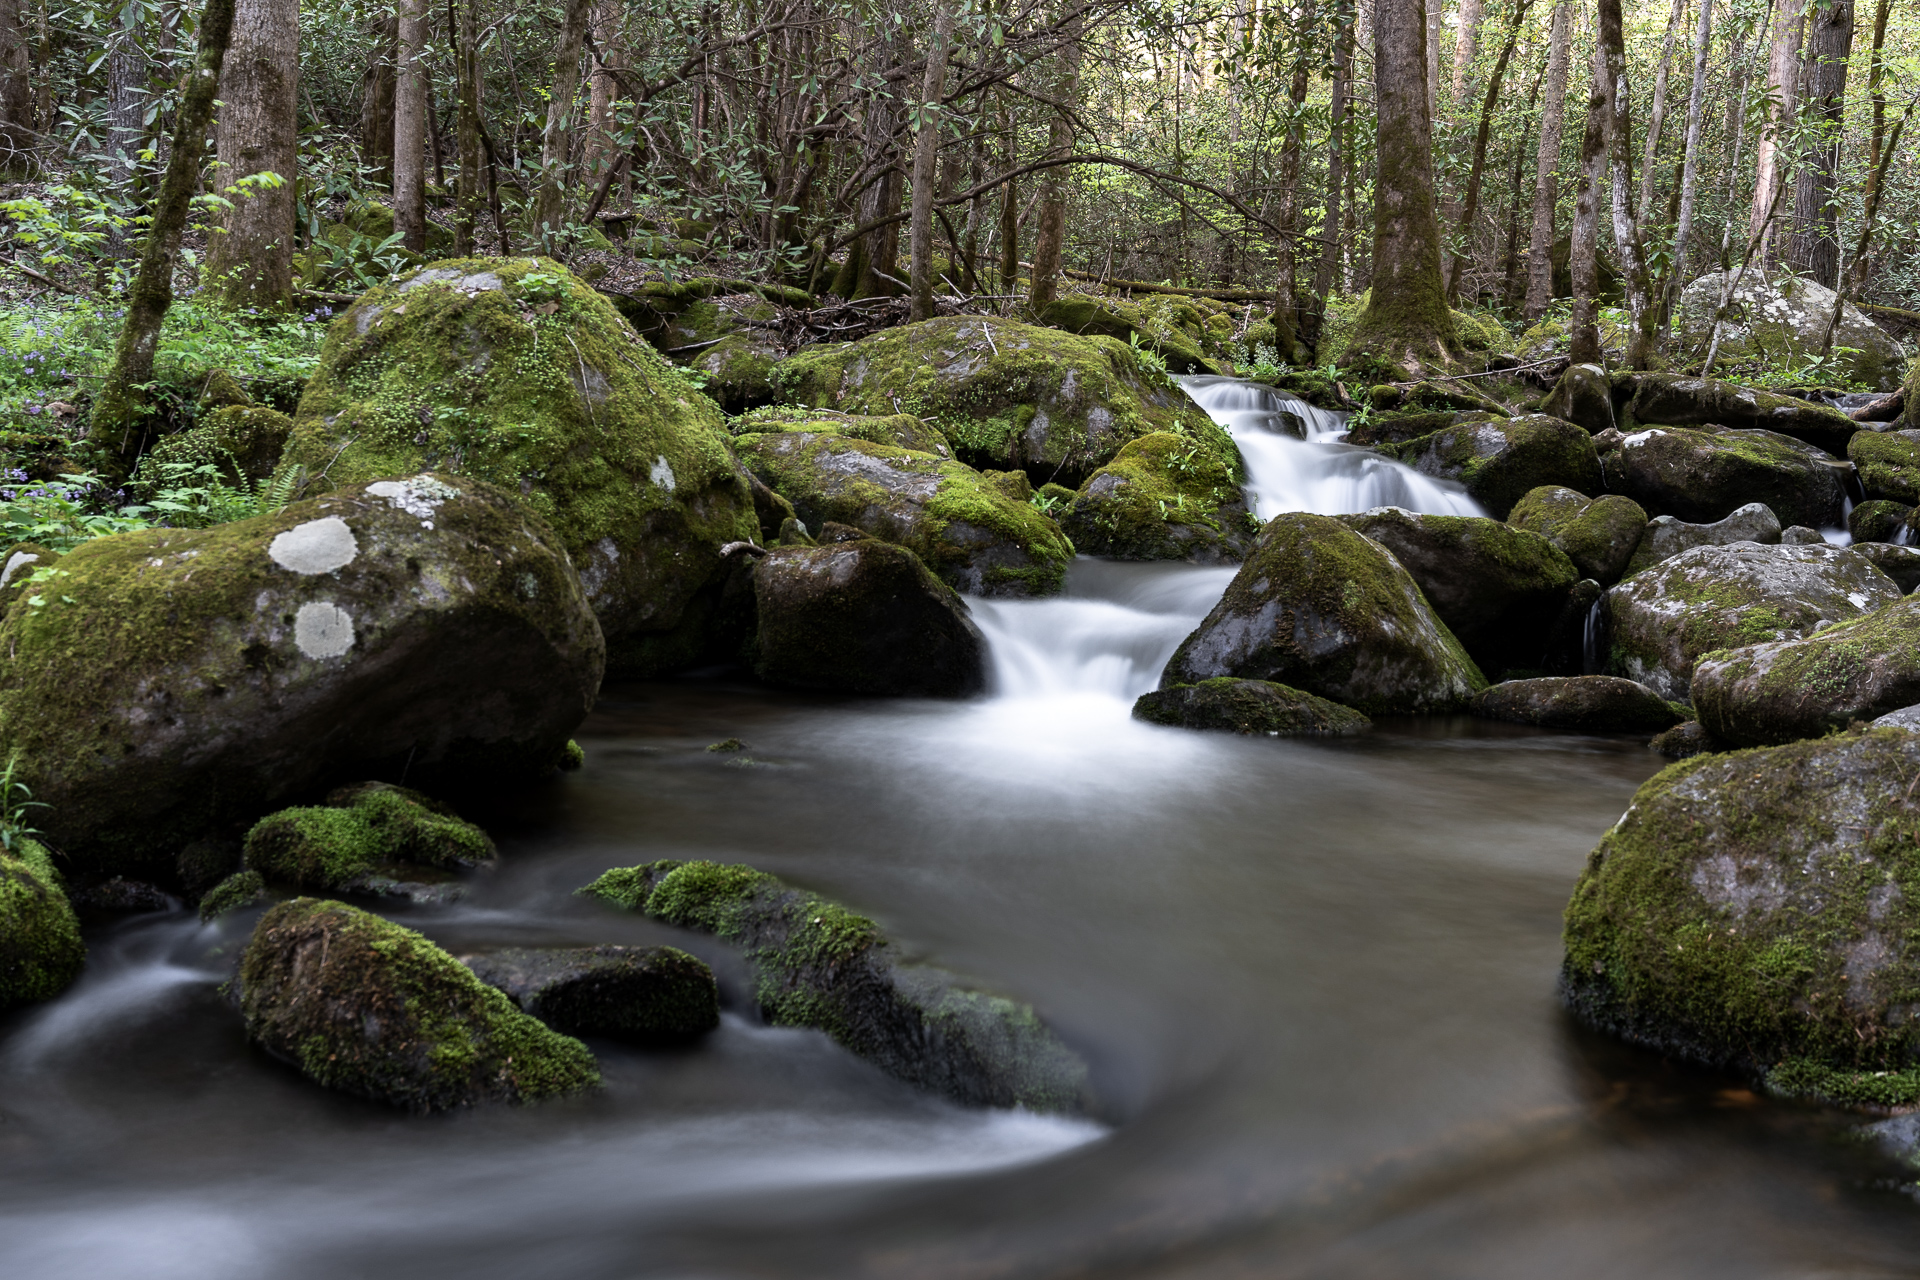 big-creek-gsmnp-great-smoky-mountains-national-park-Kathleen-Kathy-Roberts-Asheville-NC-Photographer-13.jpg